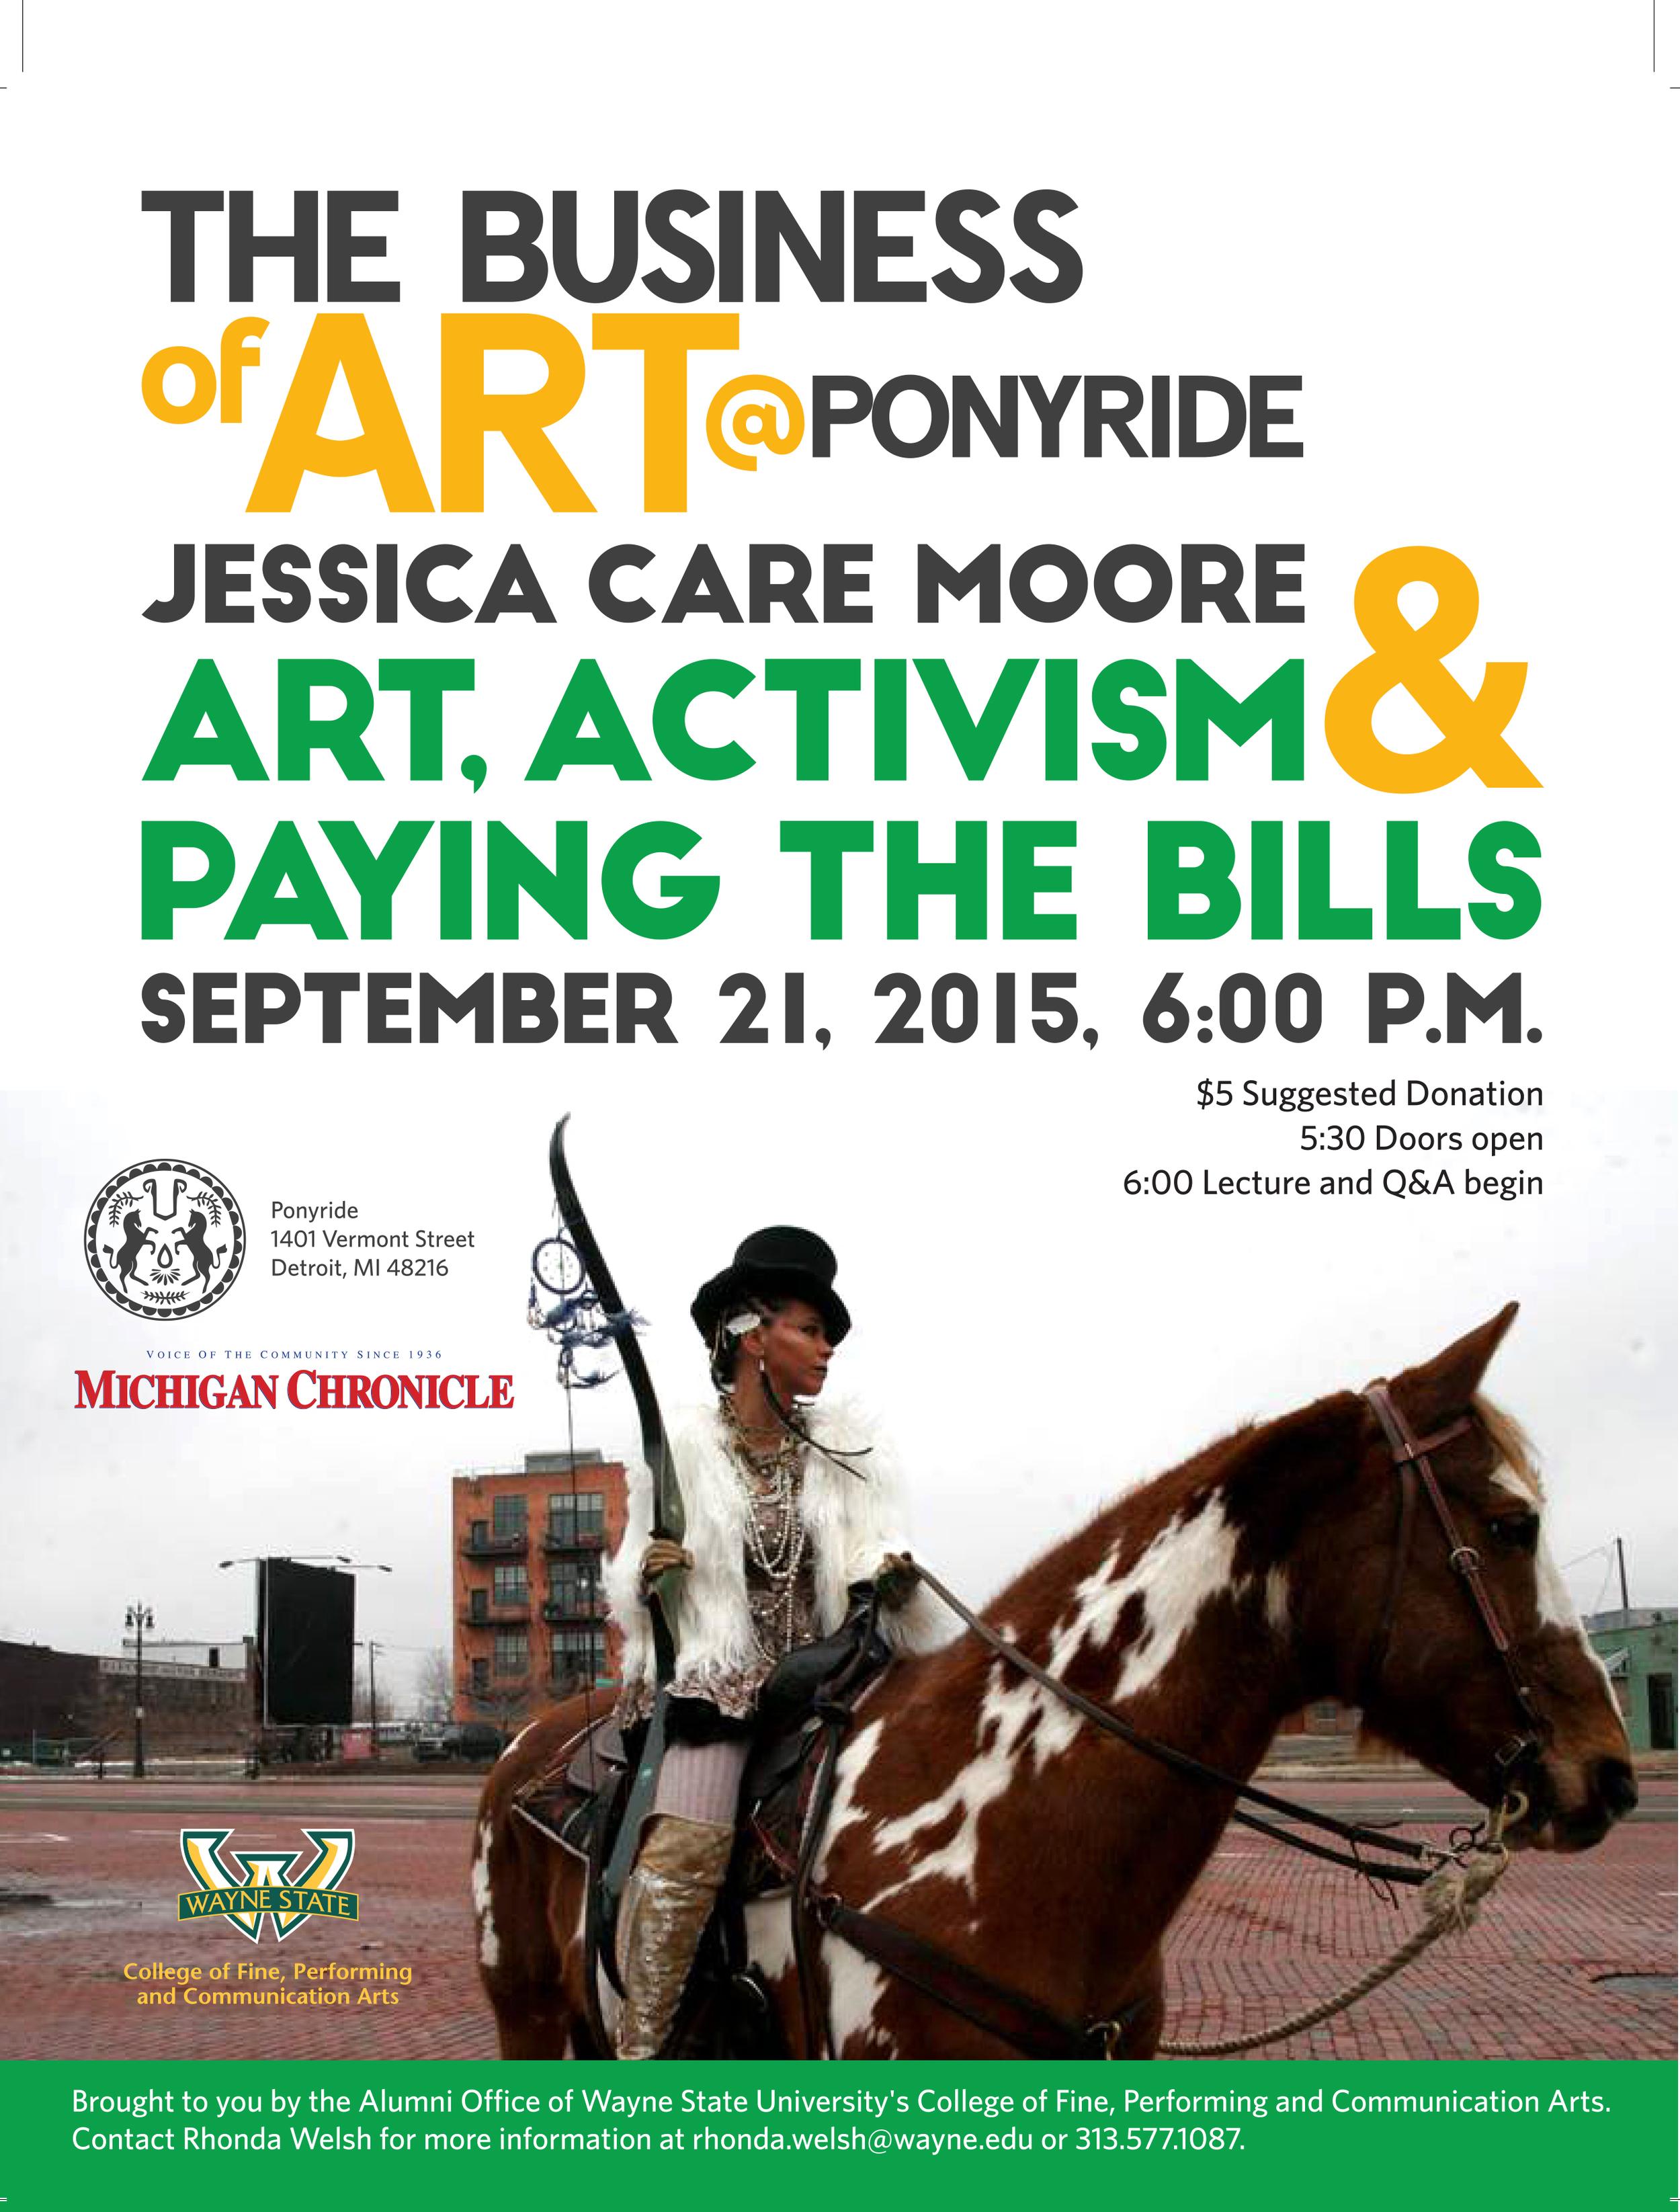 Wayne-BOA_Ponyride-JCM-September-8.5x11.jpg